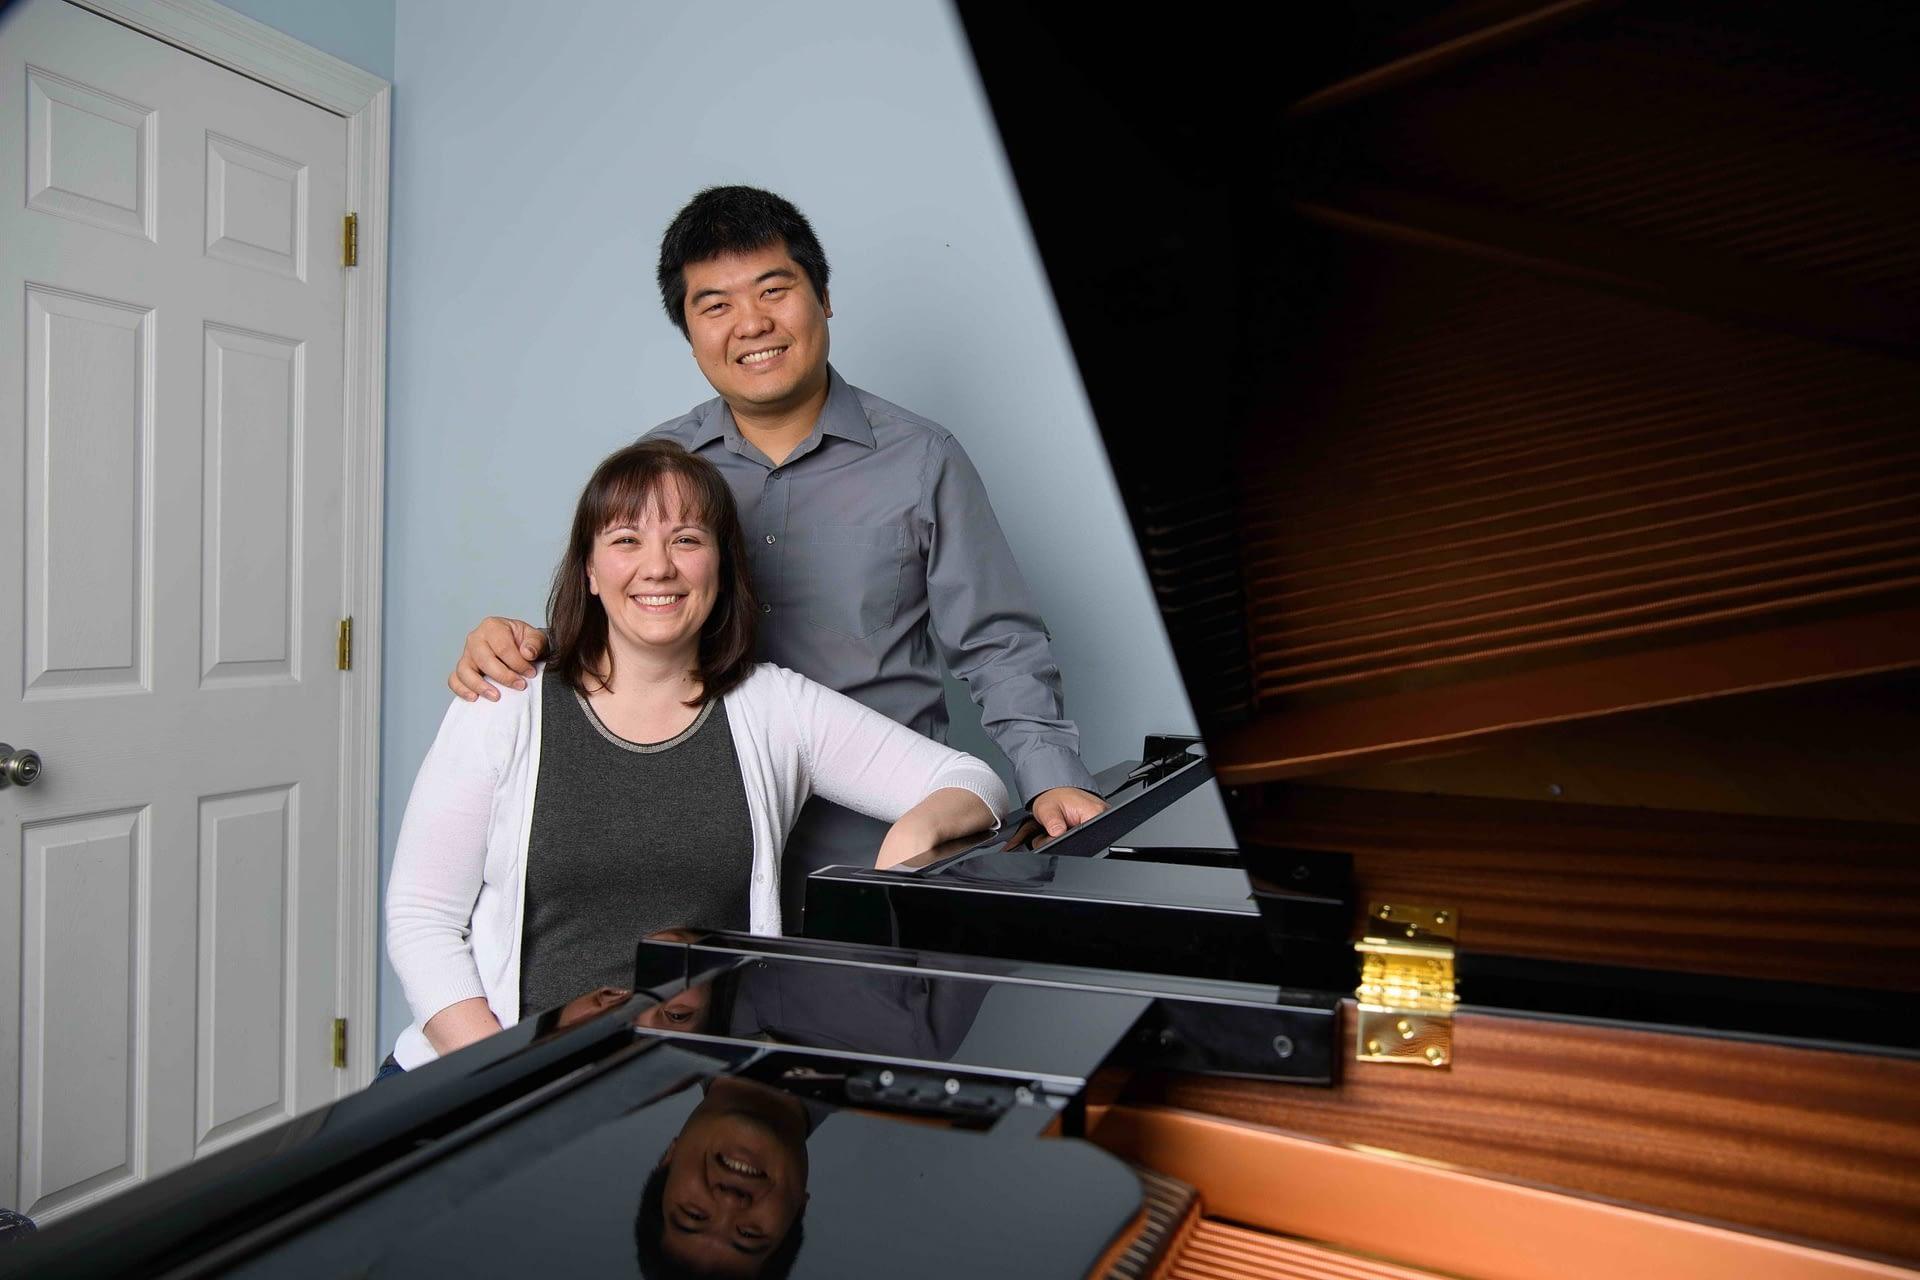 Piano teachers Robin and Raymond Yee